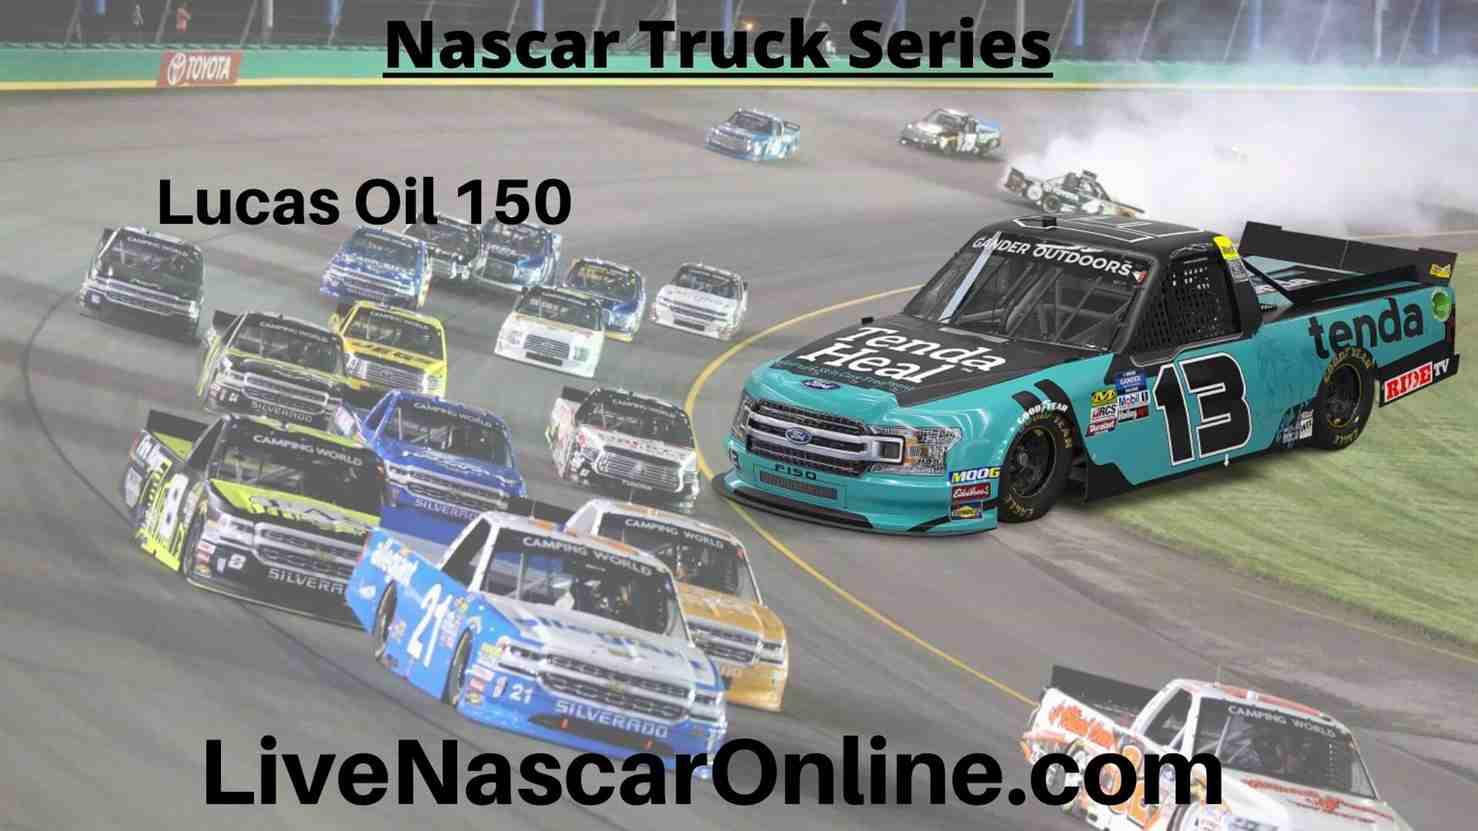 live-nascar-truck-series-lucas-oil-150-stream